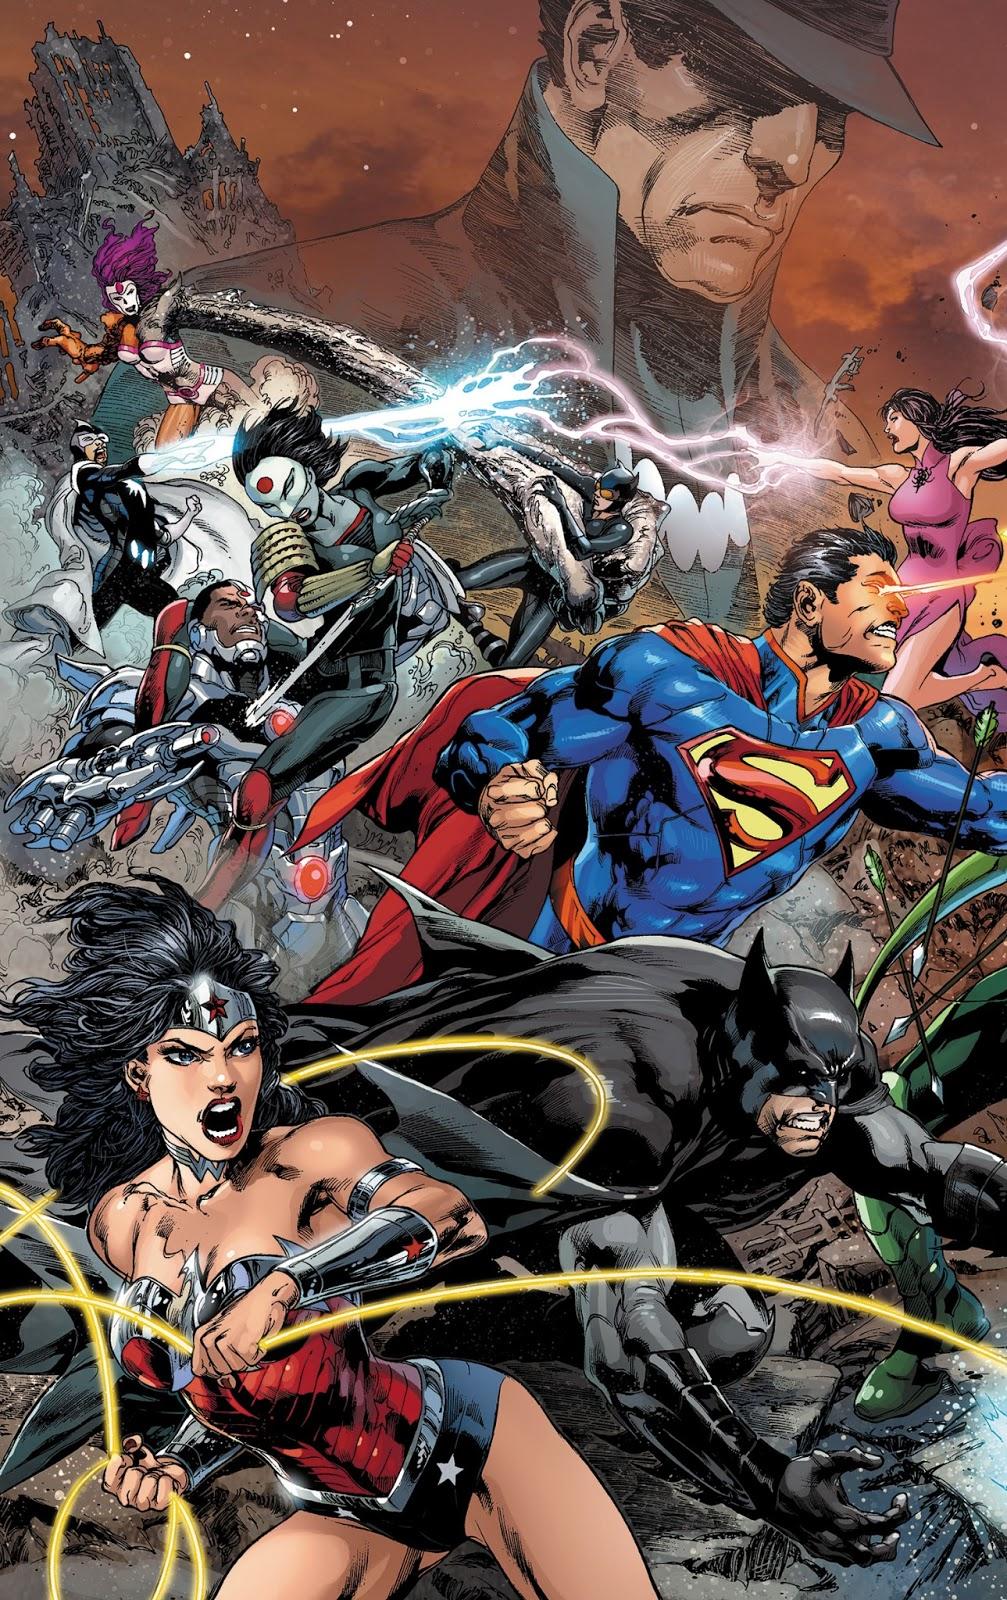 Dc Comics Justice League : Comic frontline trinity war st strike justice league